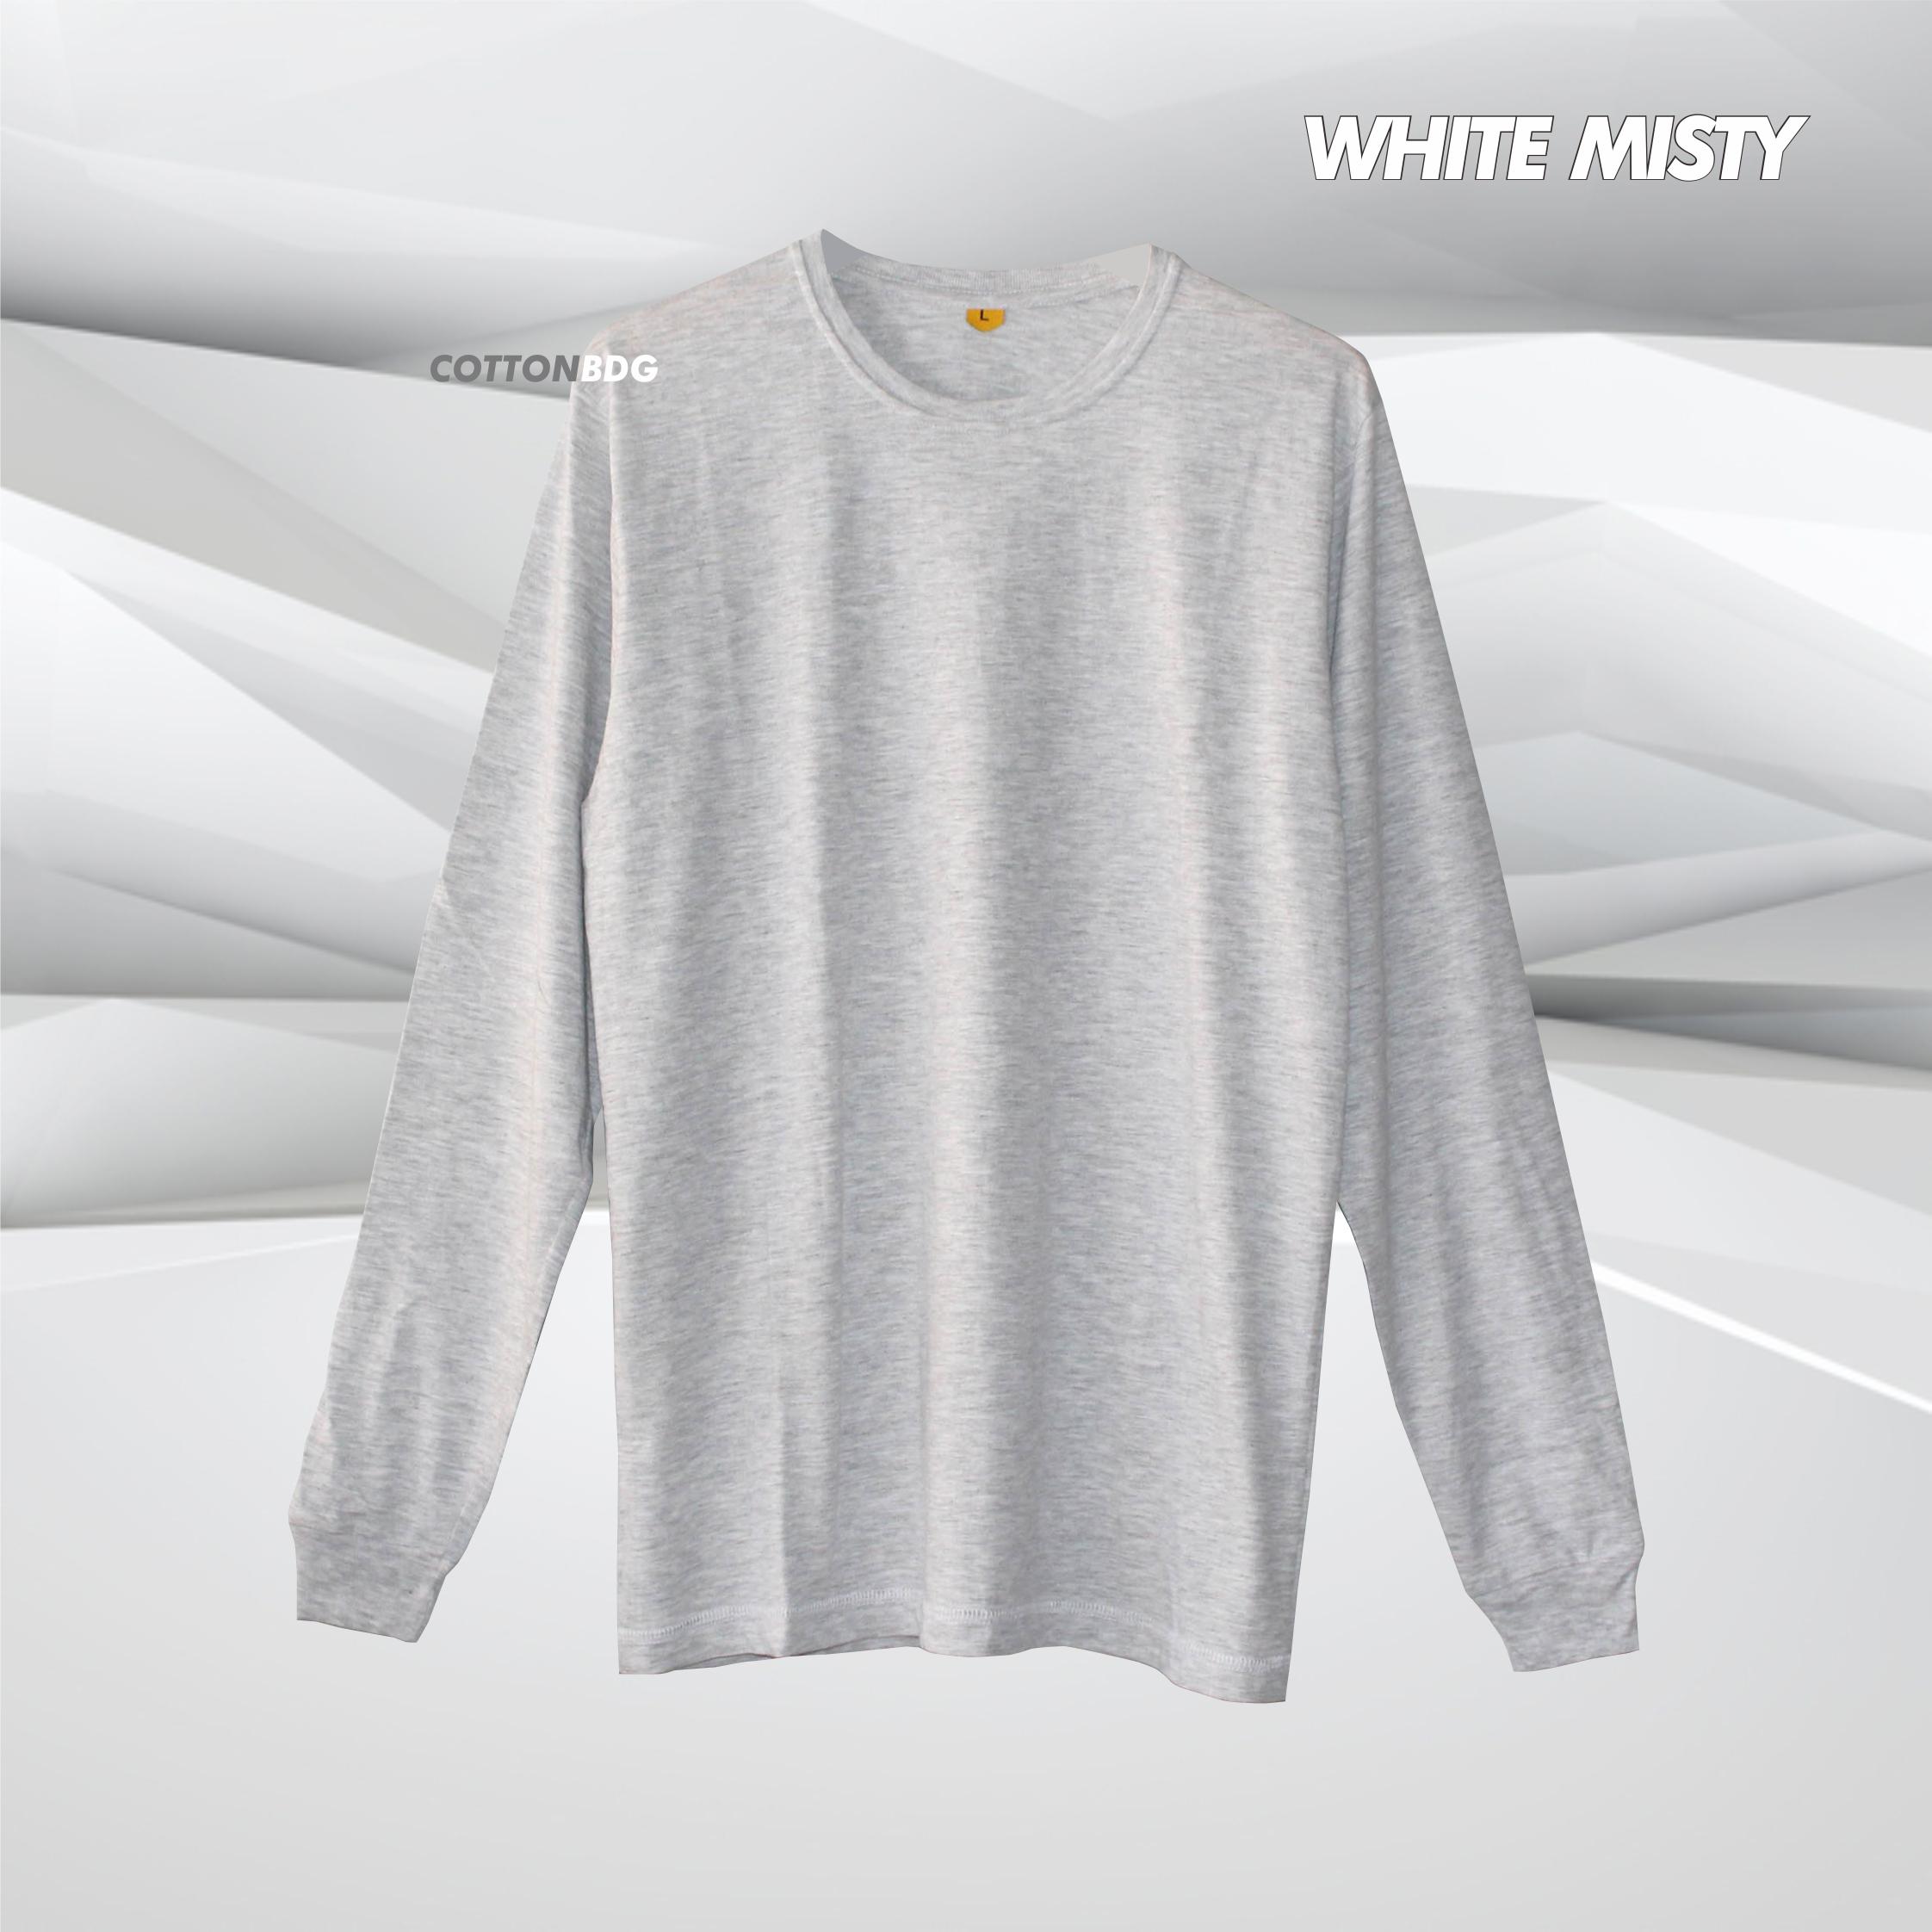 Cottonbdg Shop Line Kaos Polos Black Misty Lengan Panjang White